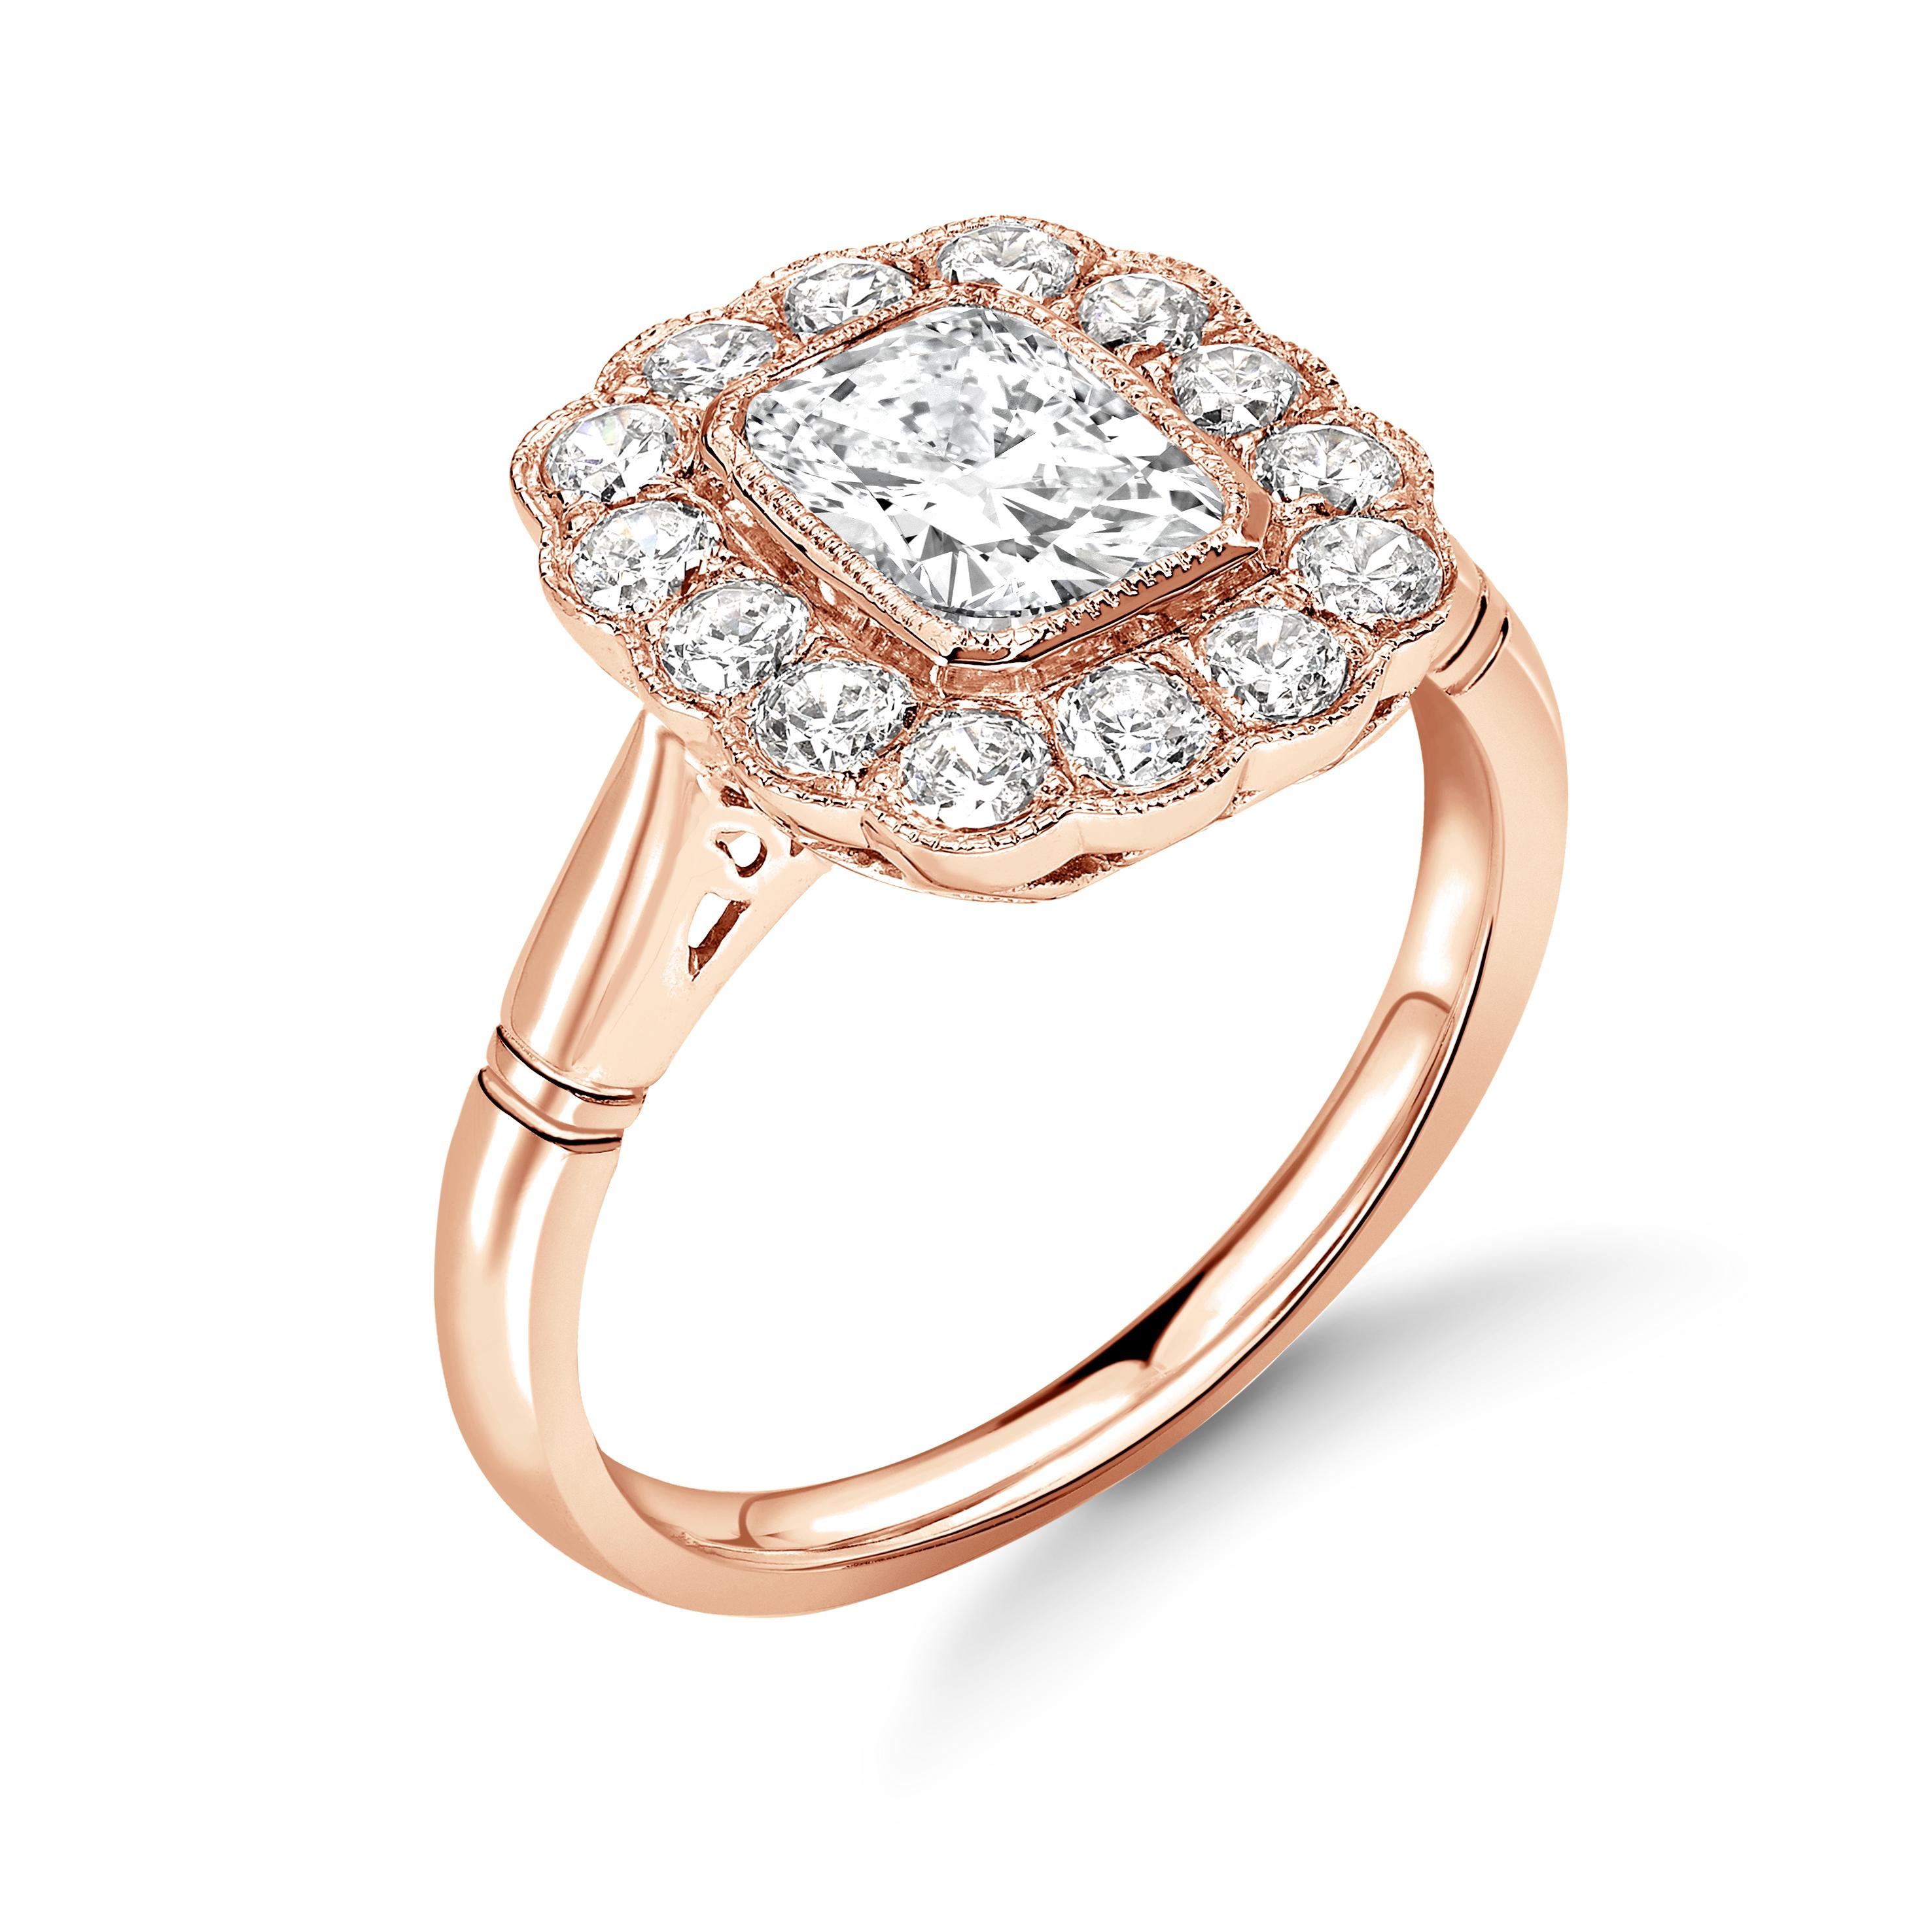 Bezel Setting Radiant Shape Miligrain Halo Diamond Engagement Rings